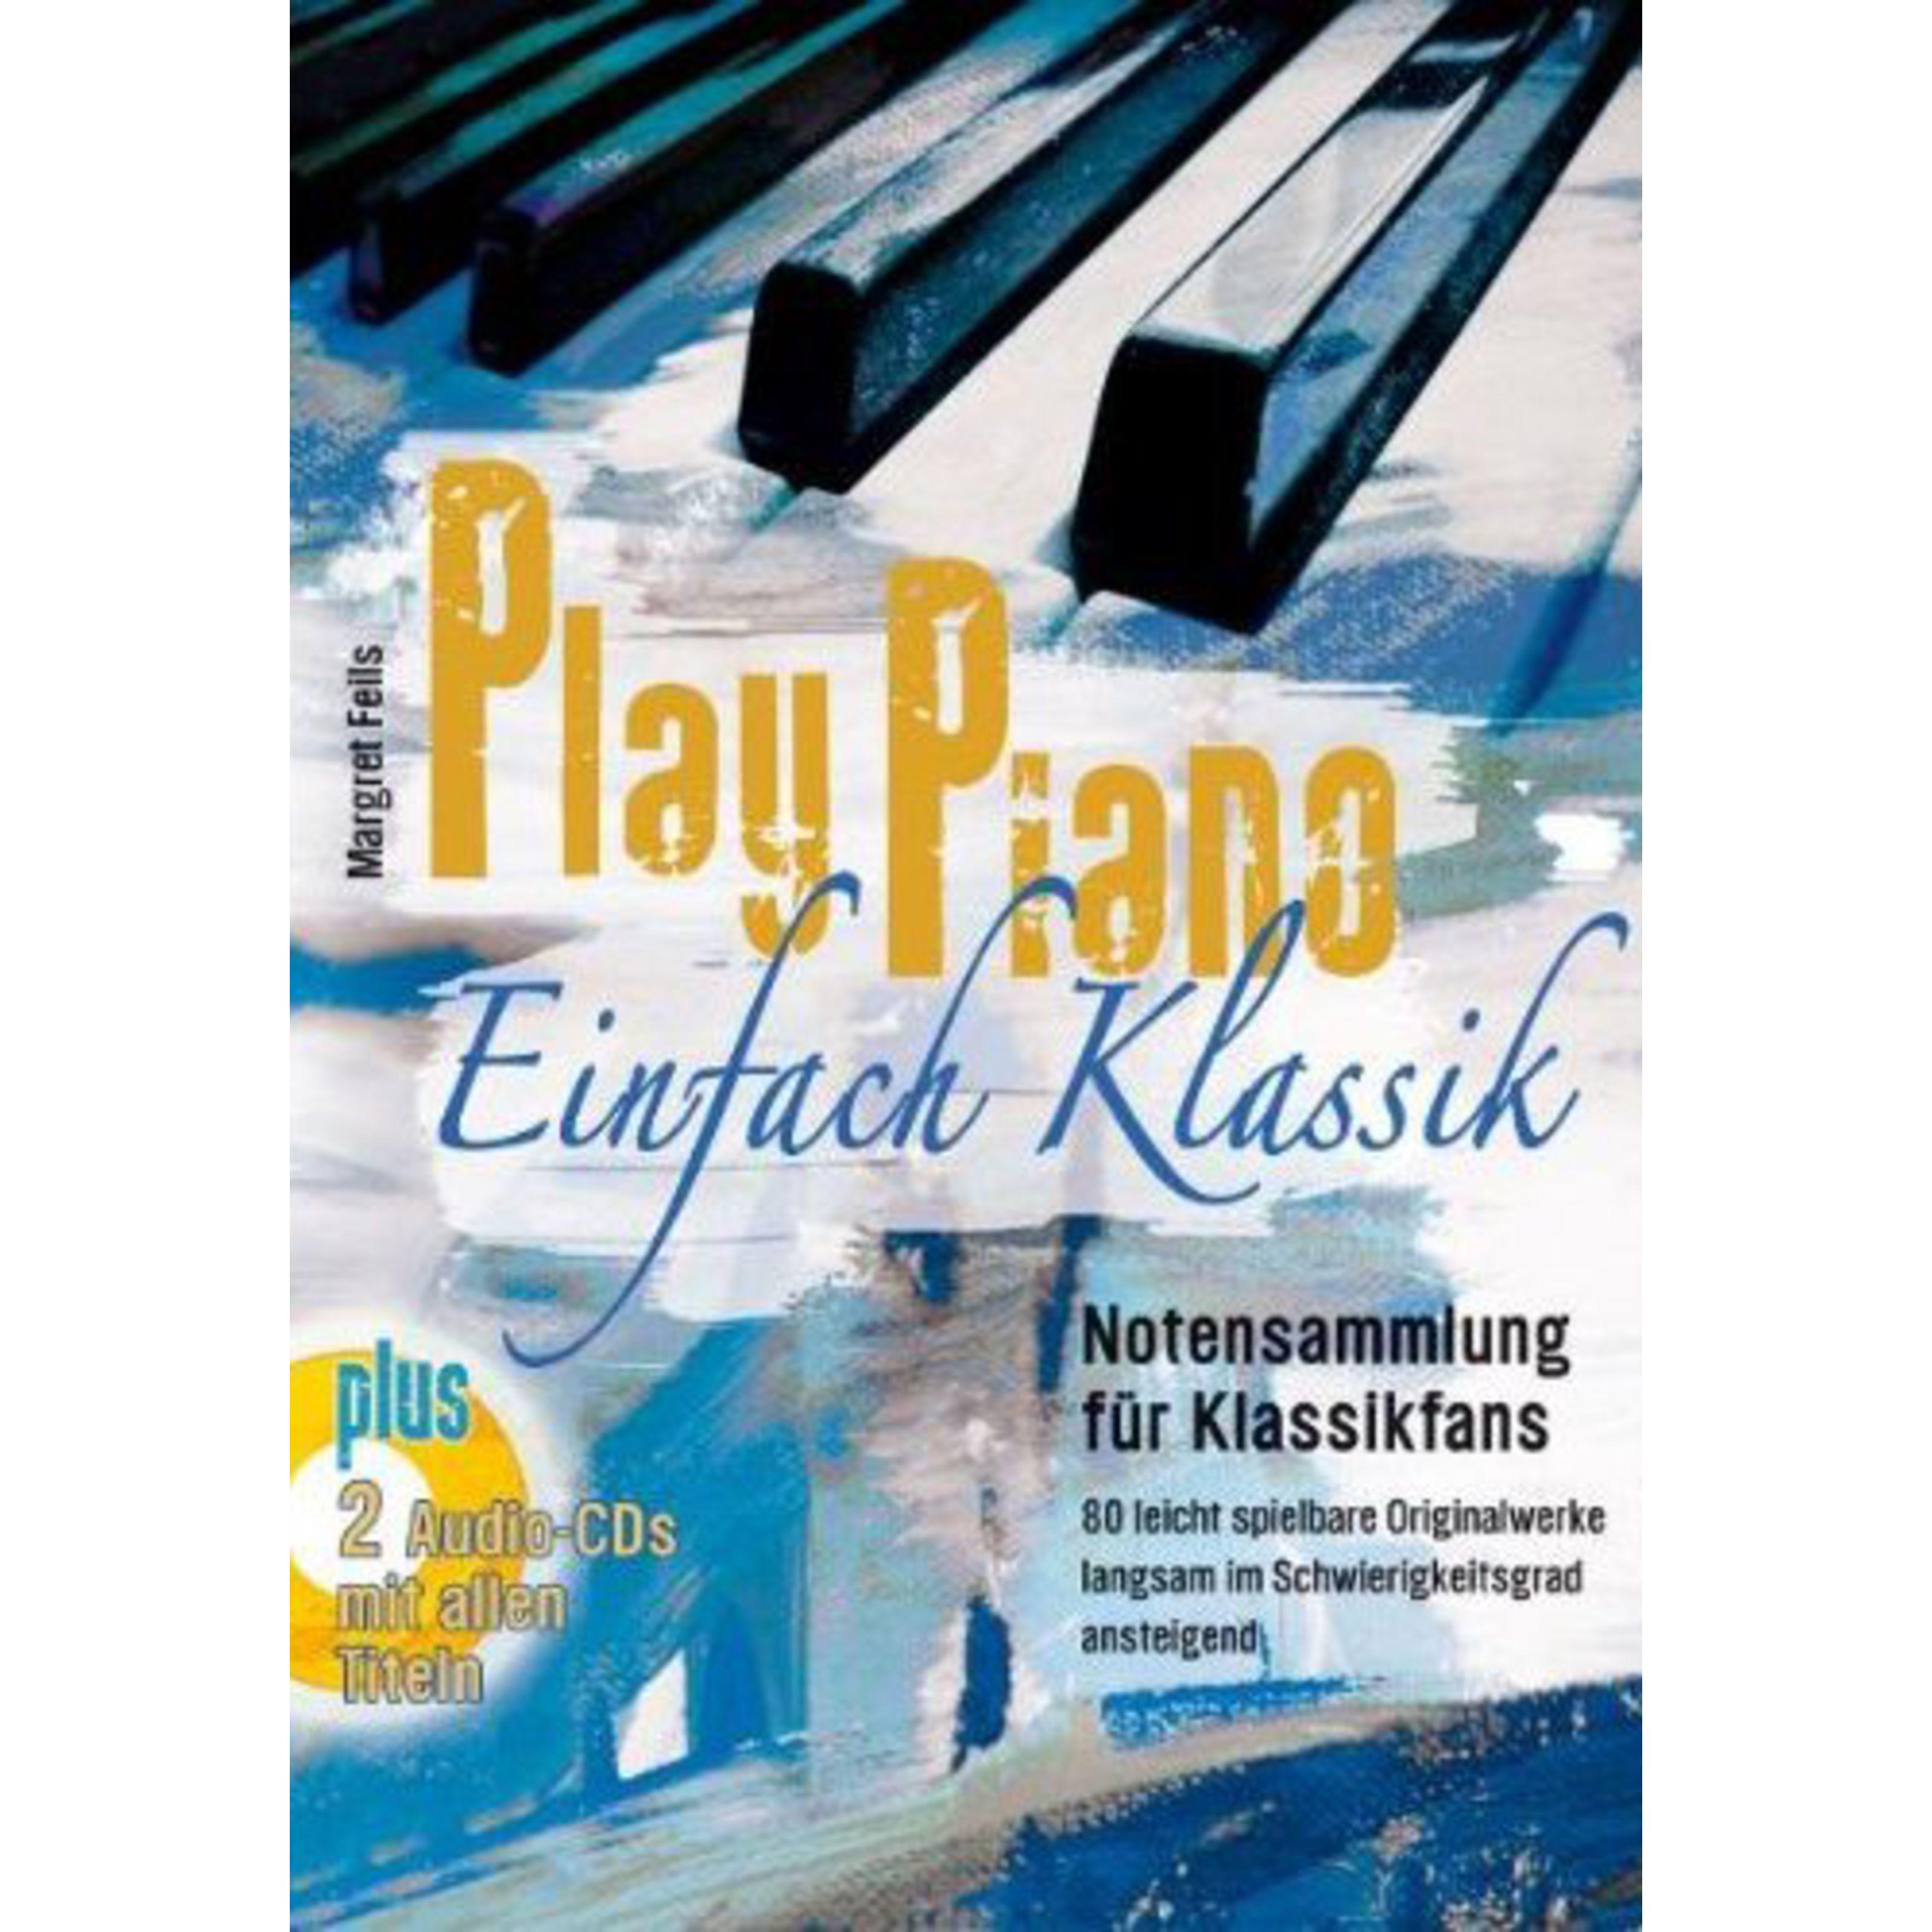 Gerig-Verlag - Play Piano - Einfach Klassik EM 6175